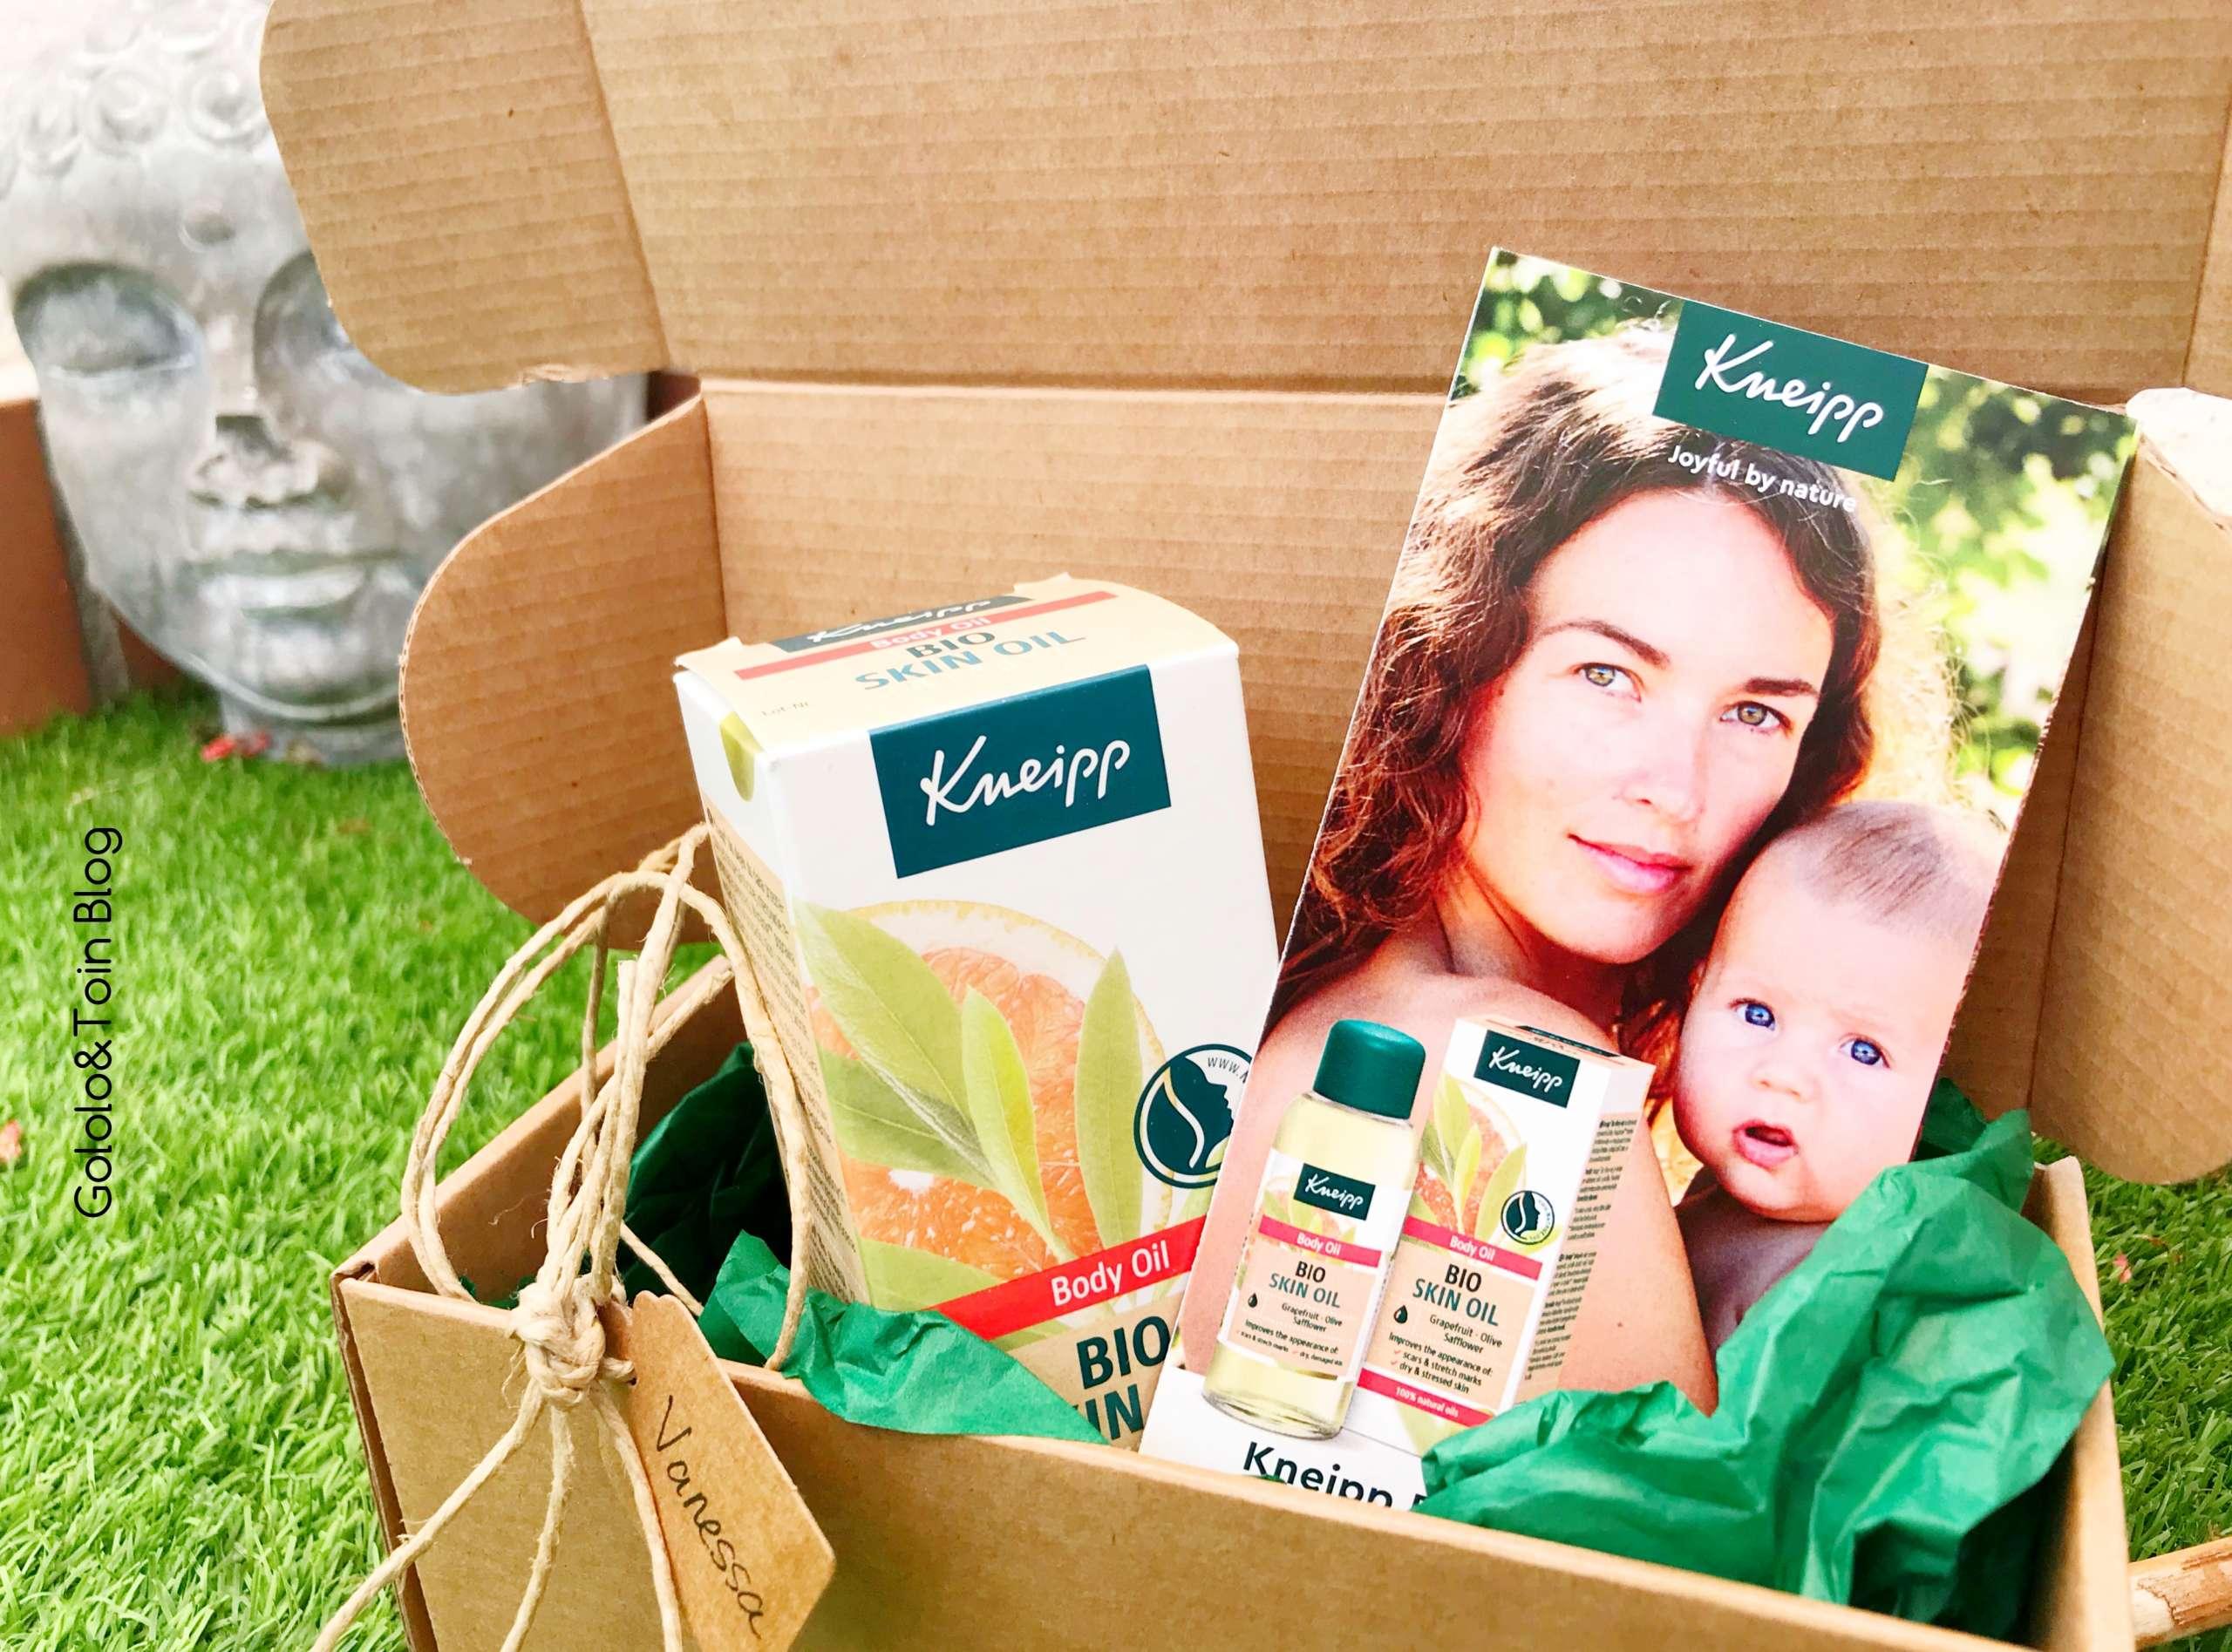 Bio Skin Oil de Kneipp, cosmética natural